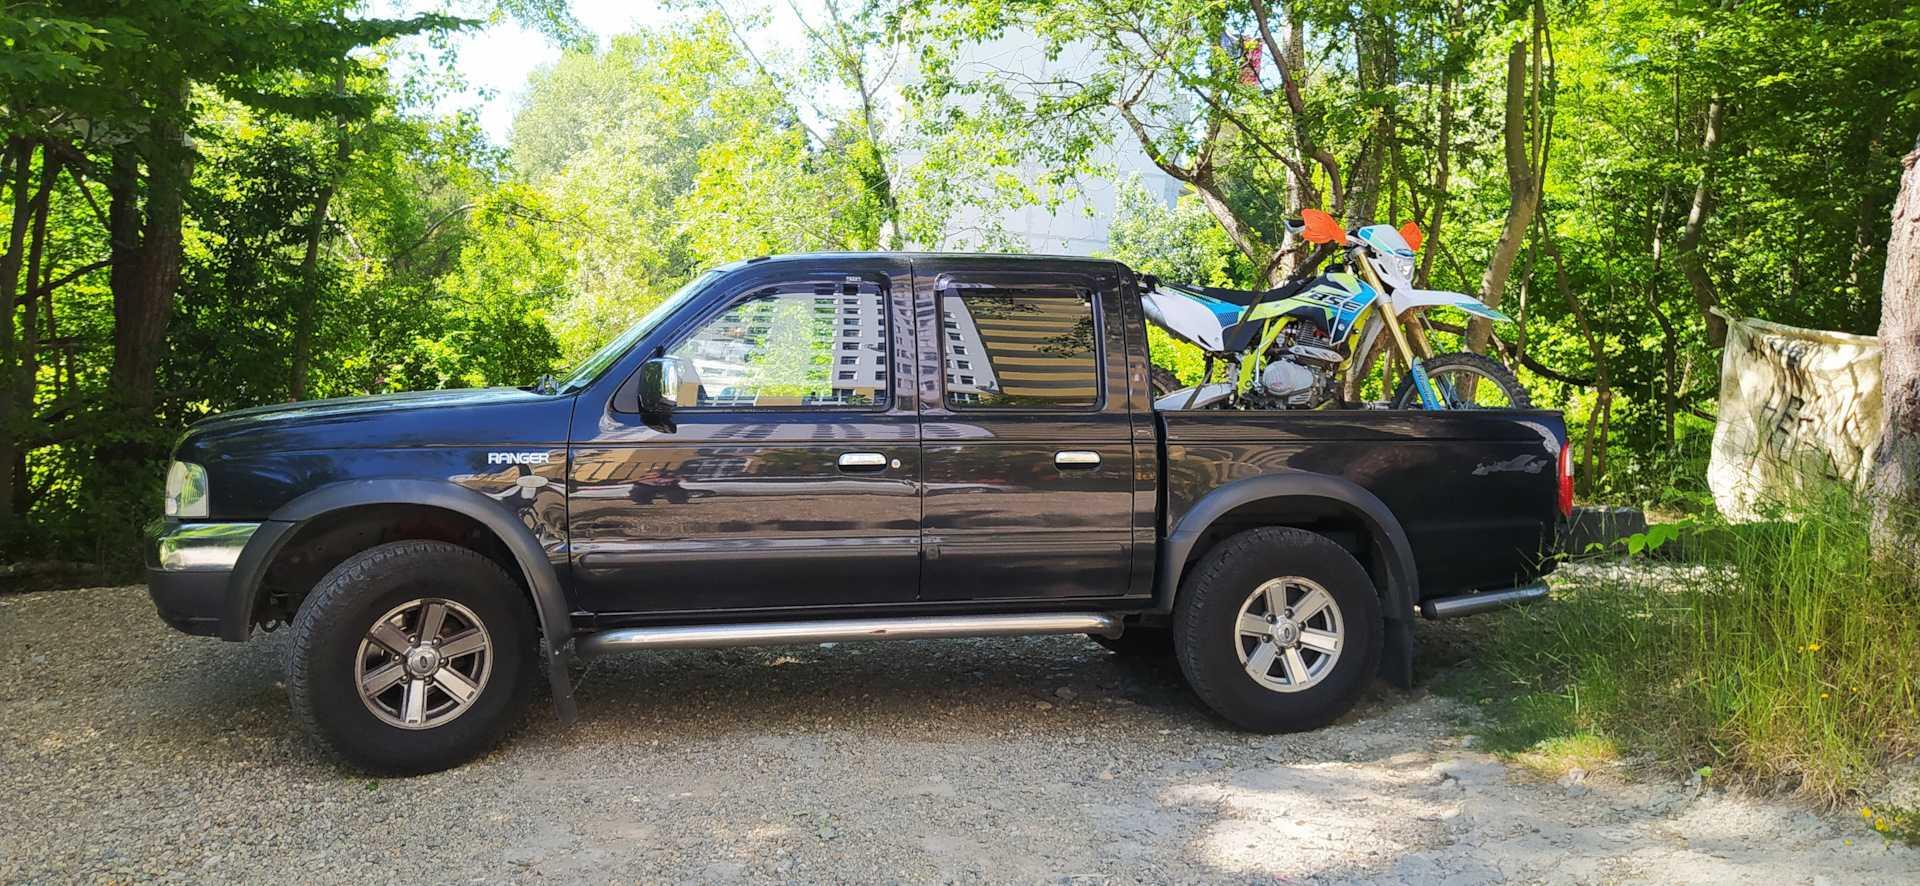 Ford ranger 2019-2020: цена, фото